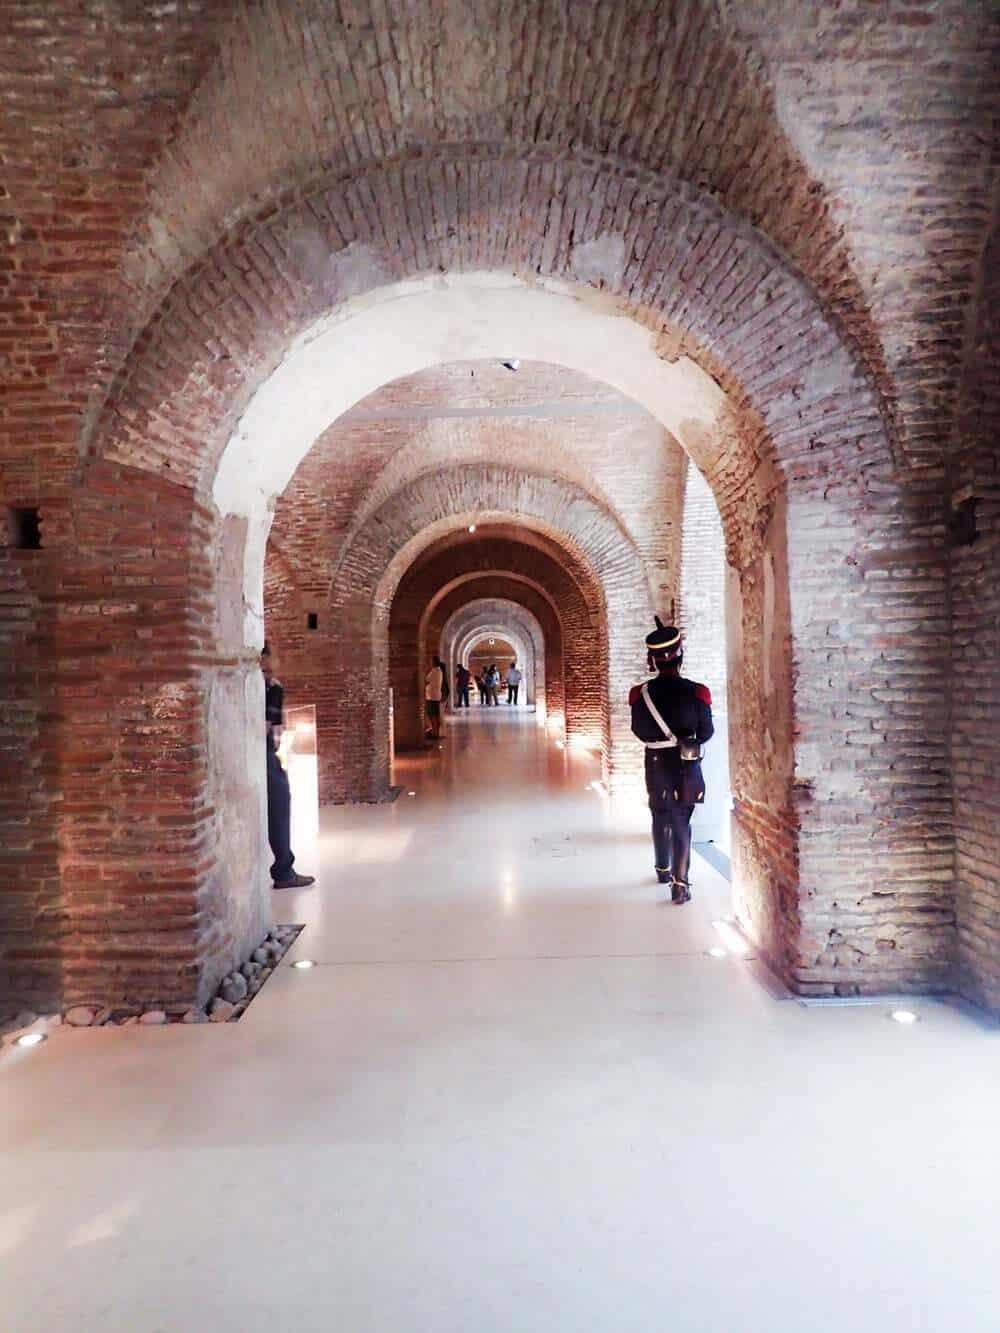 Tunnels in Museo del Bicentenario